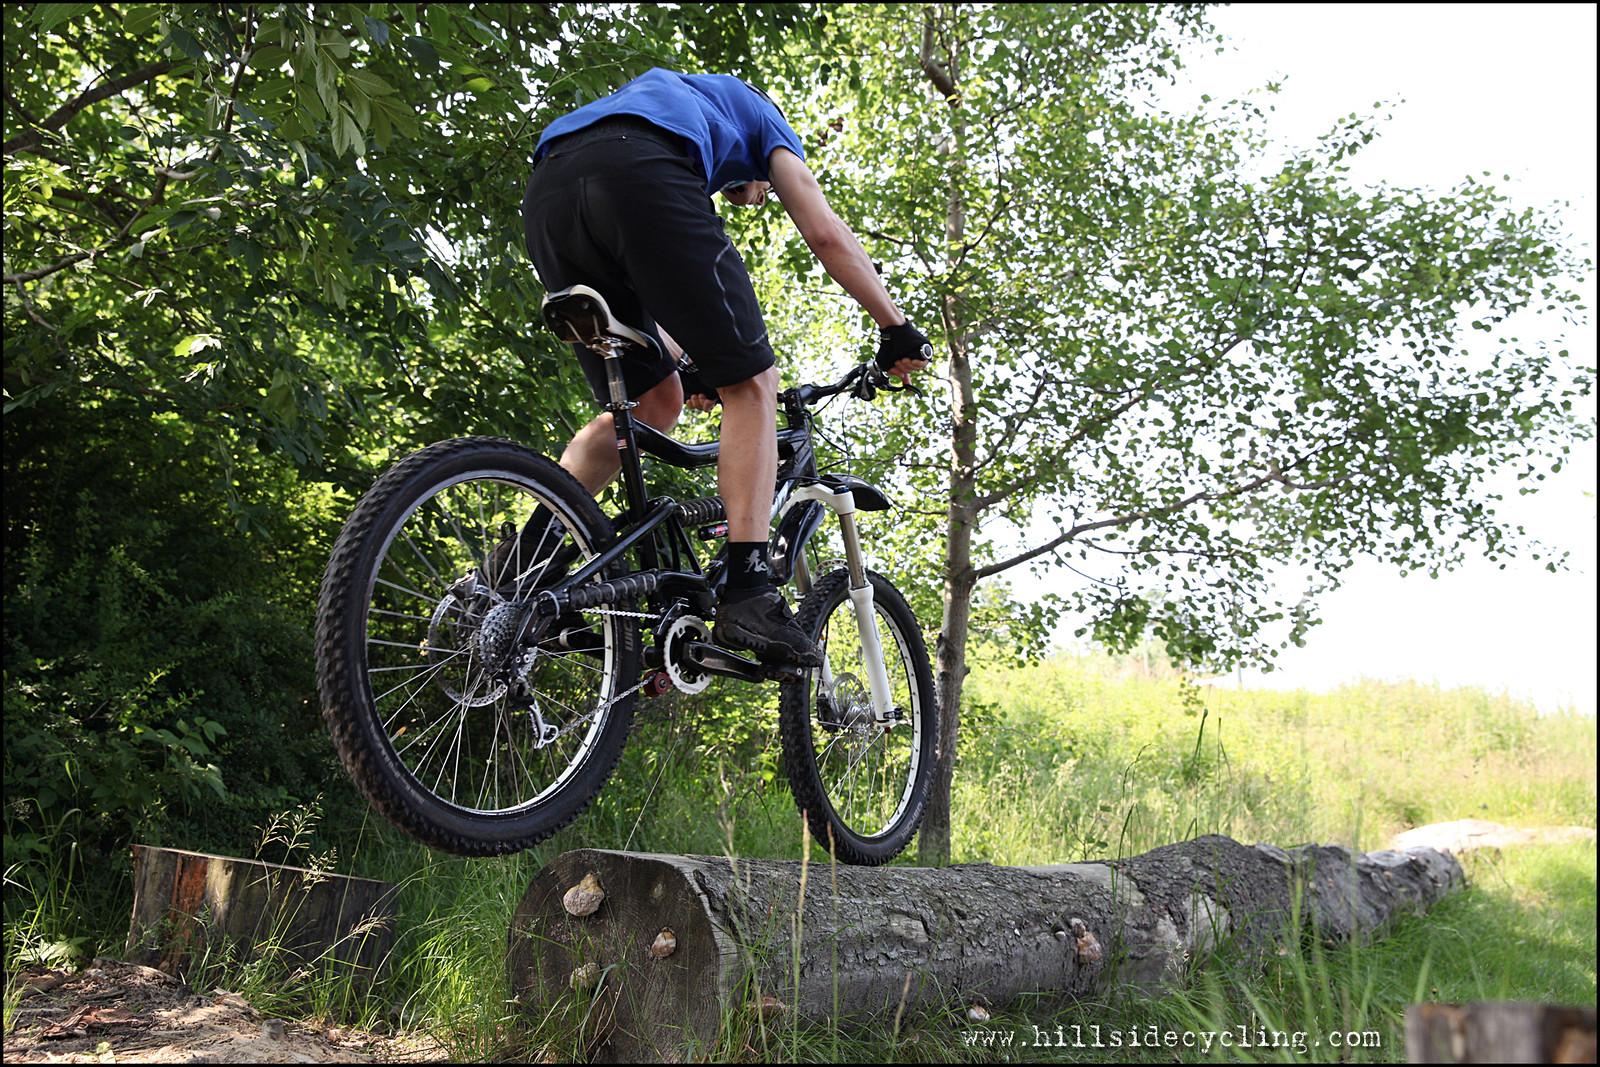 Log Ride - Hillside Cycling - Mountain Biking Pictures - Vital MTB